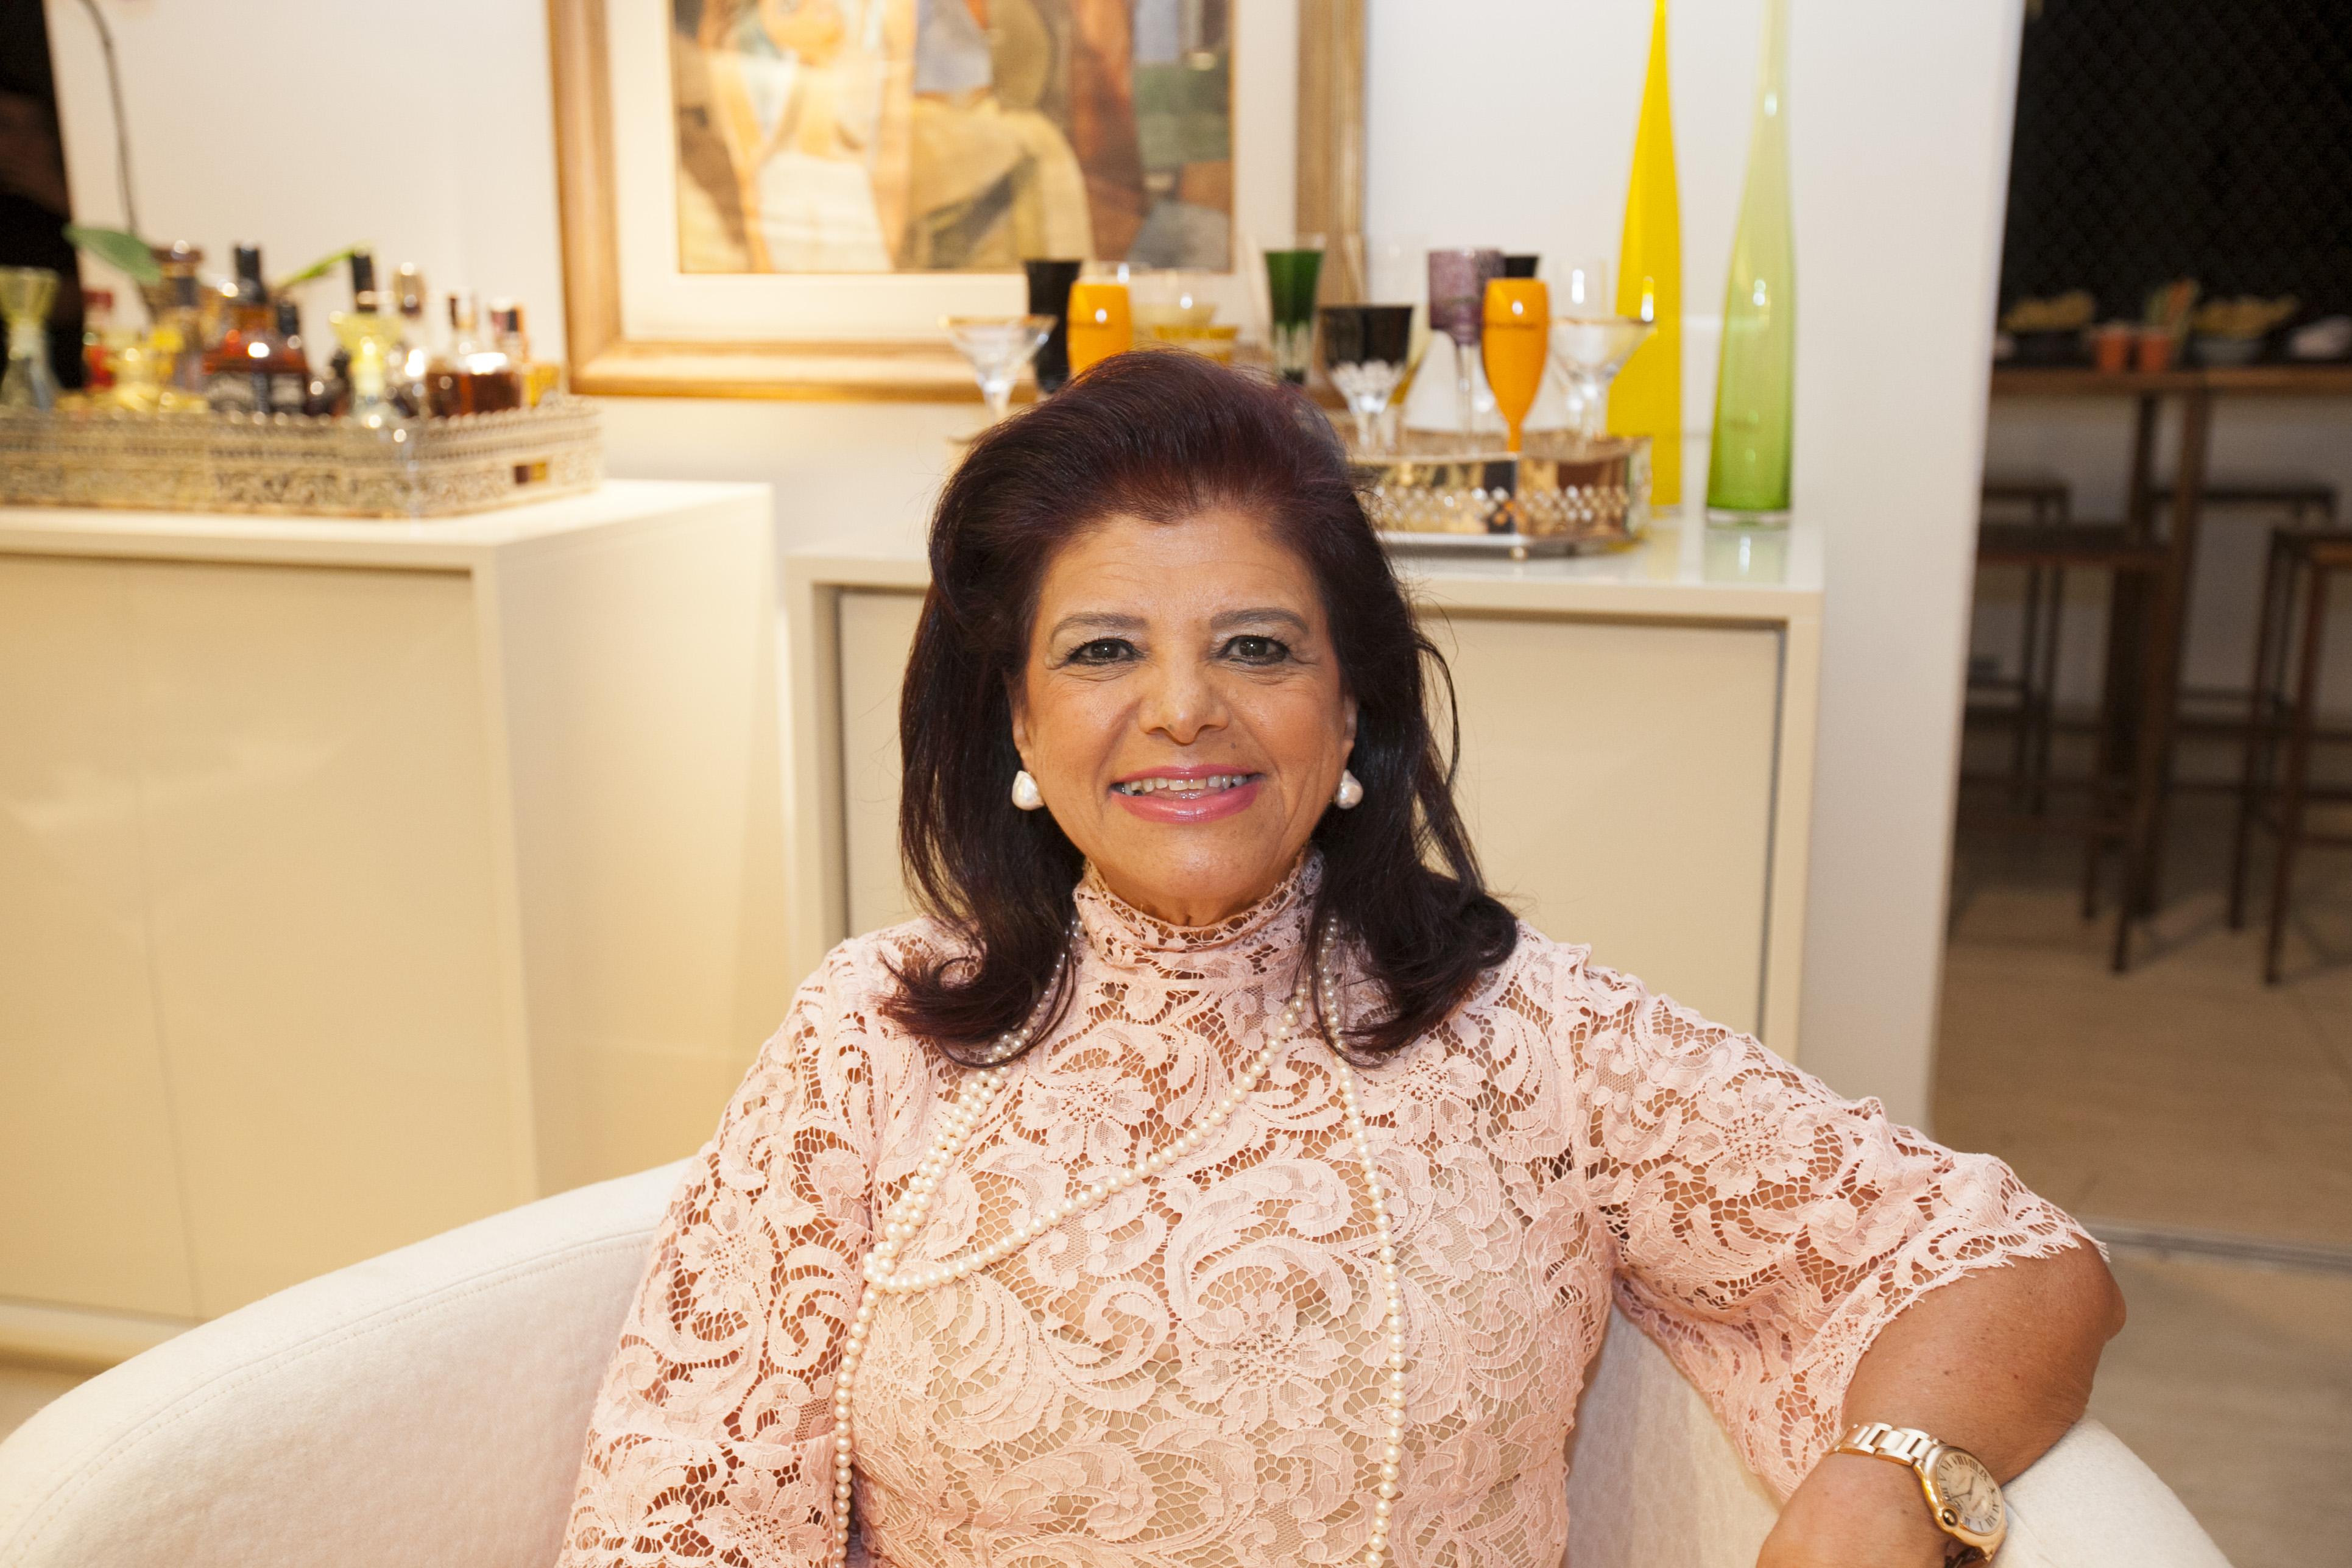 https://revistaraca.com.br/wp-content/uploads/2018/02/Luiza-Helena-Trajano.jpg